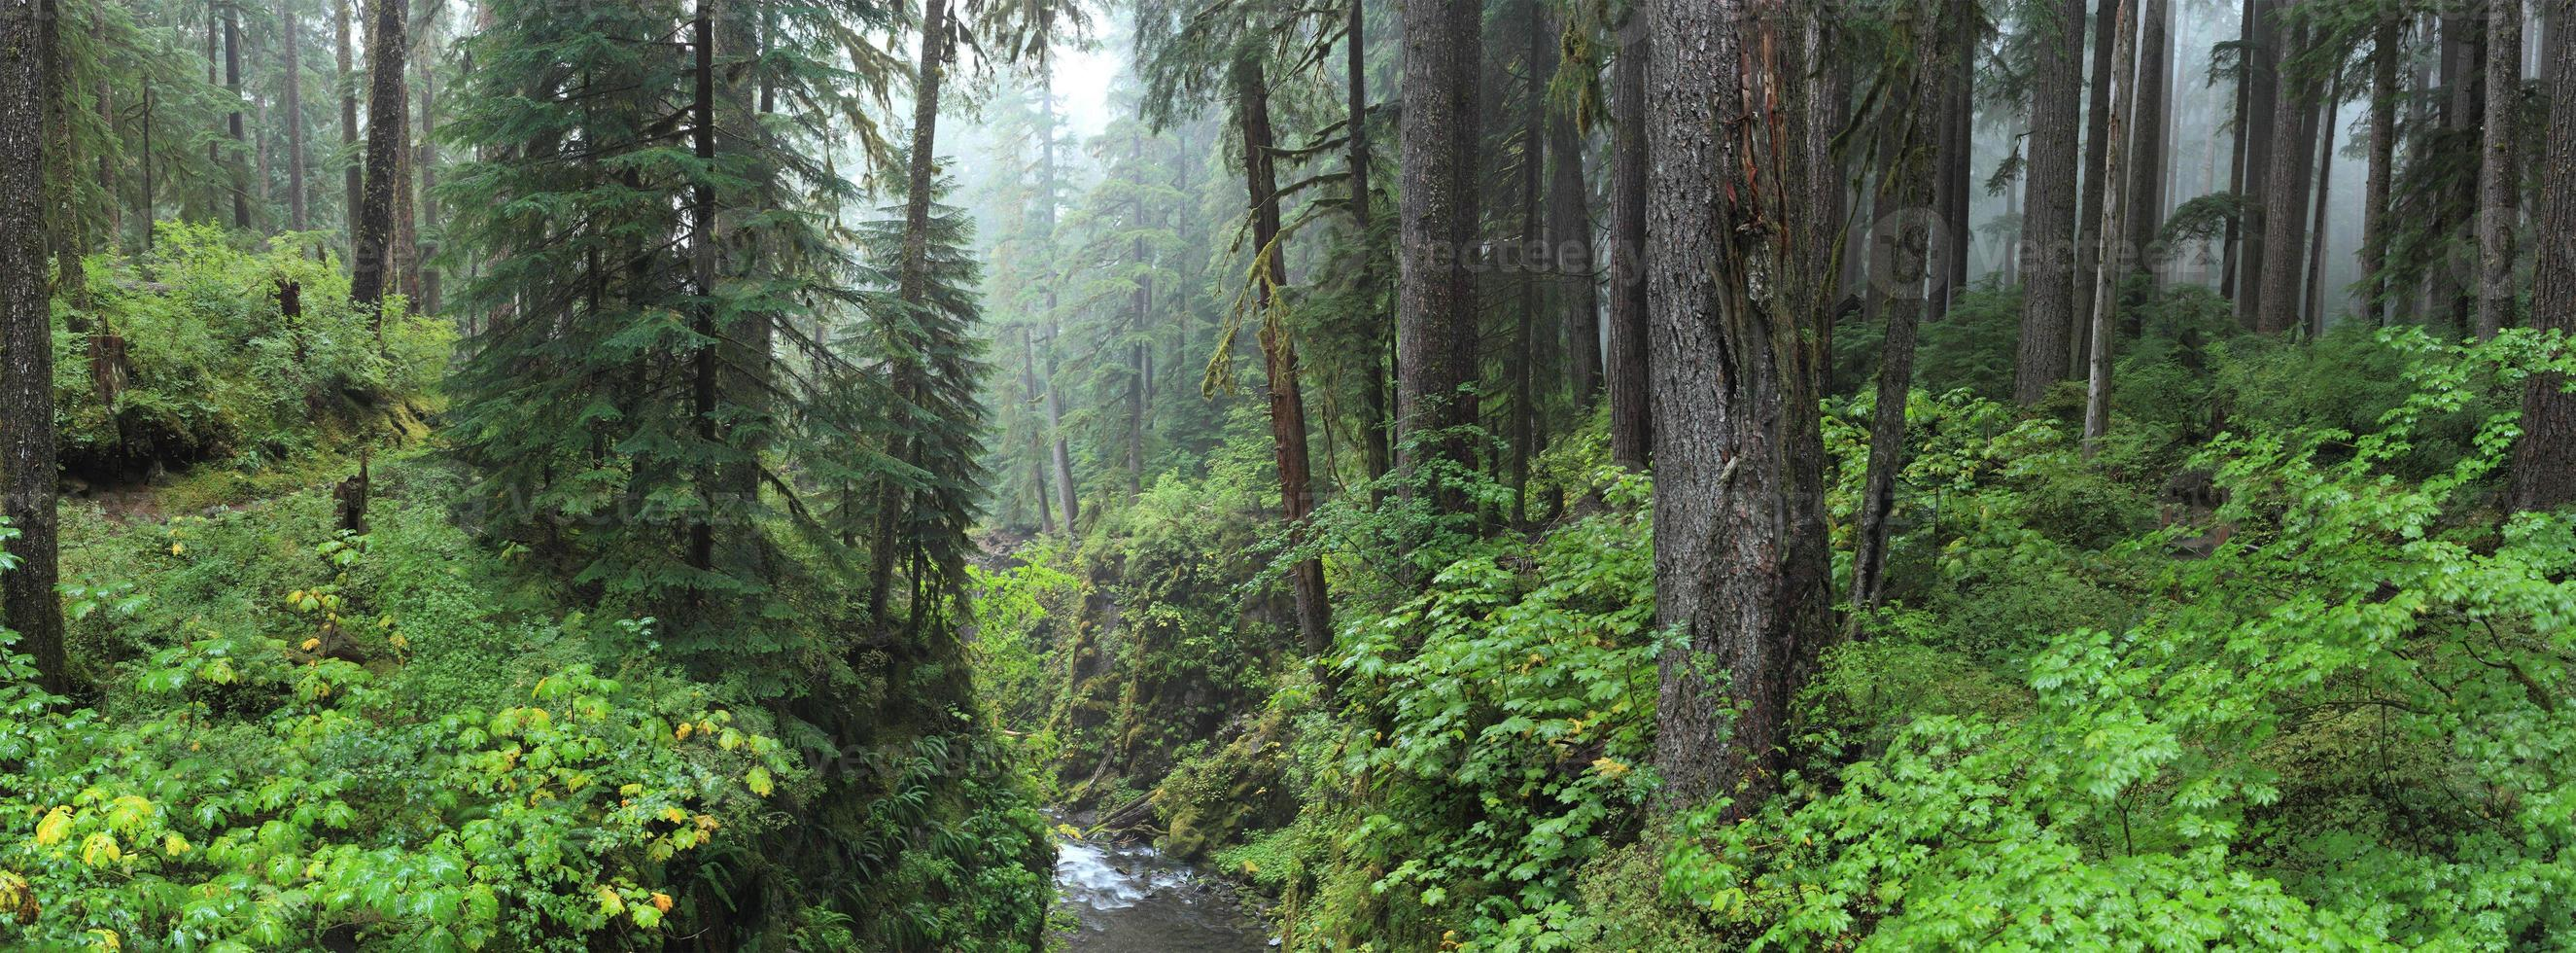 floresta tropical hoh foto